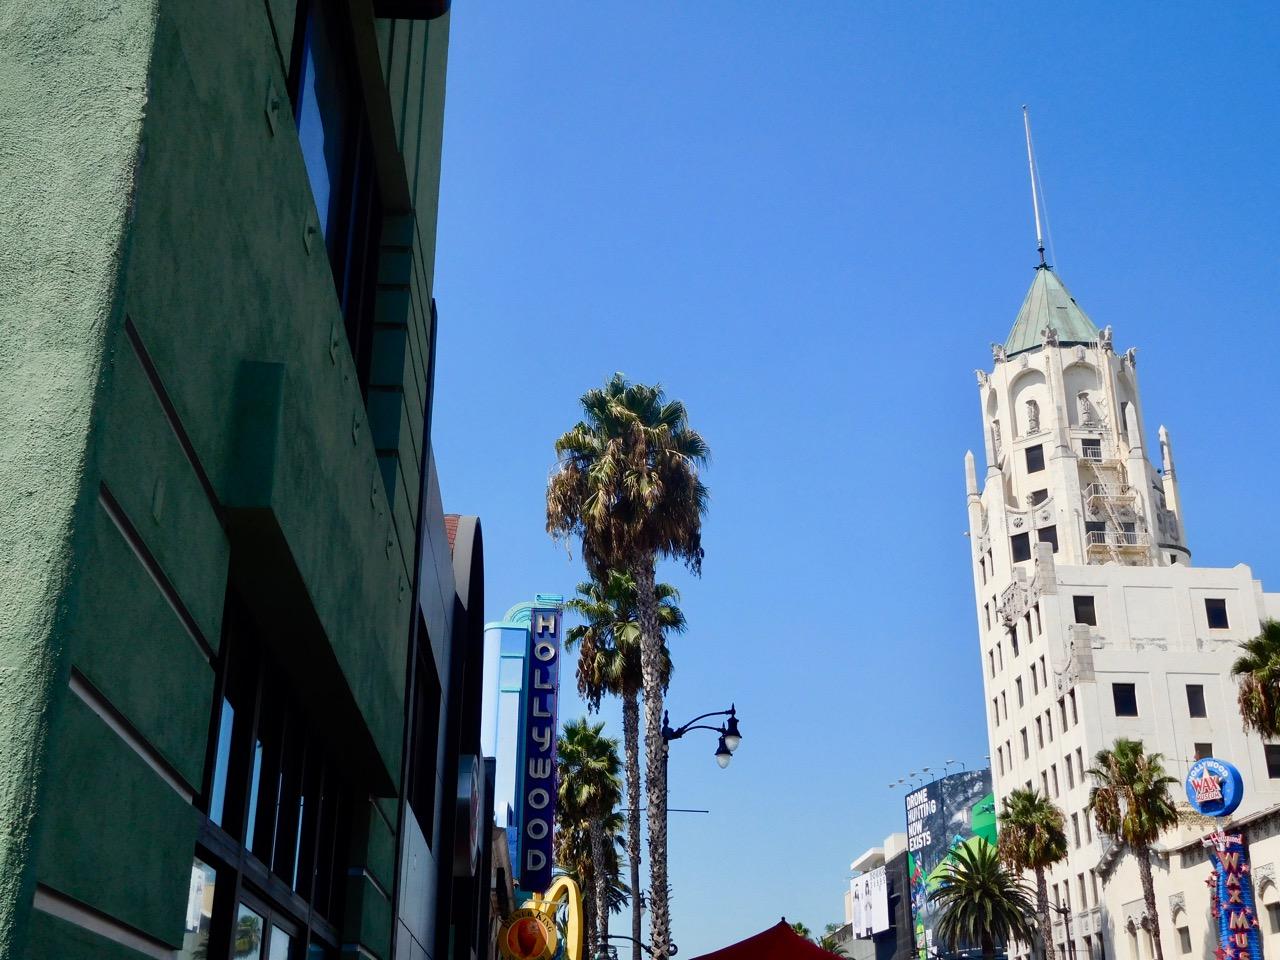 3 Days in Hollywood - Hollywood Boulevard (3)